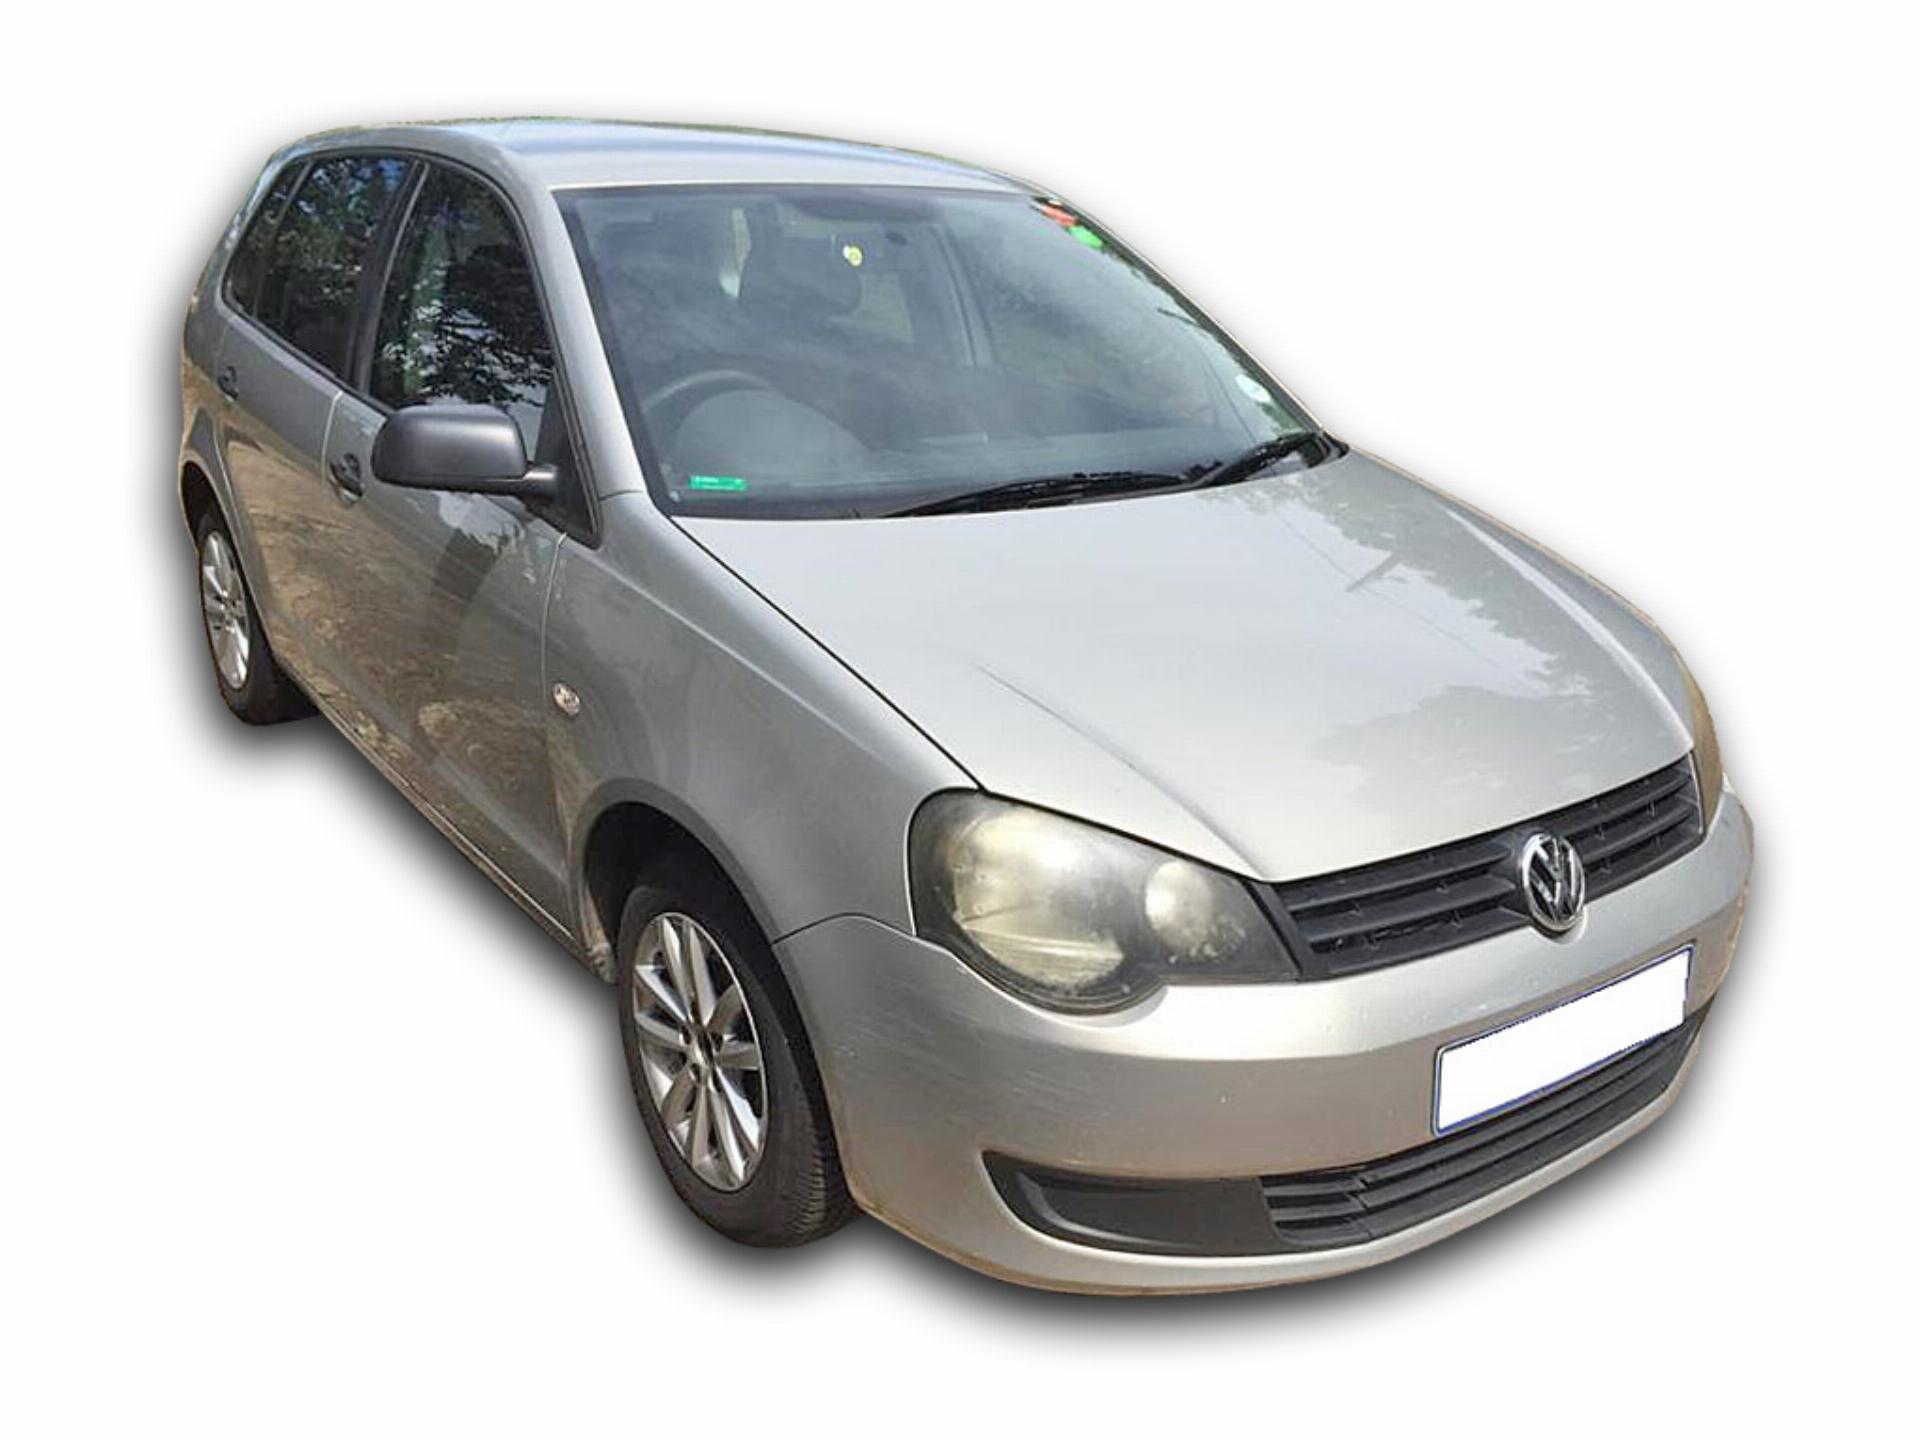 VW Polo Vivo Trendline 1.4 5 Door